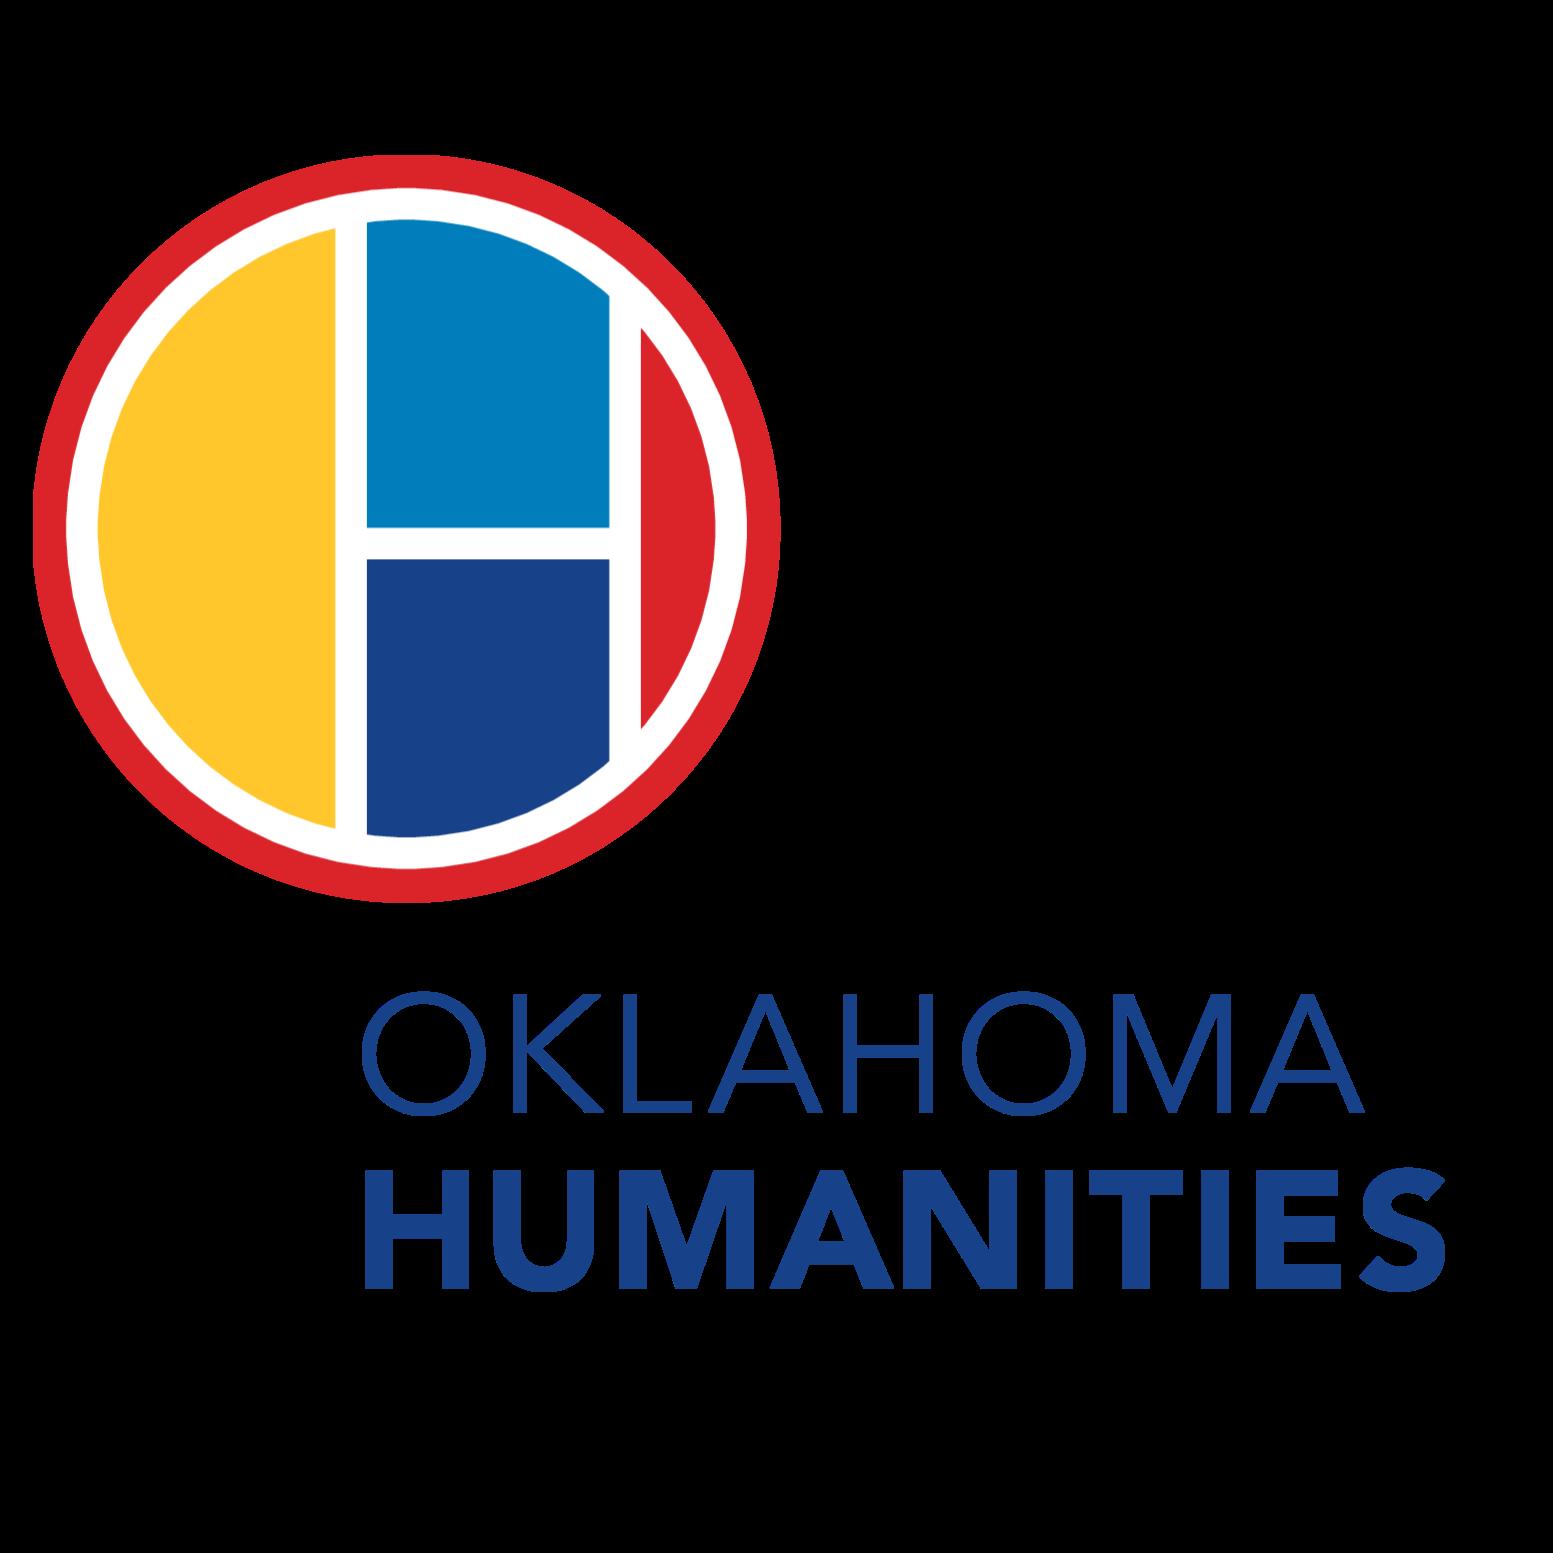 Oklahoma Humanities